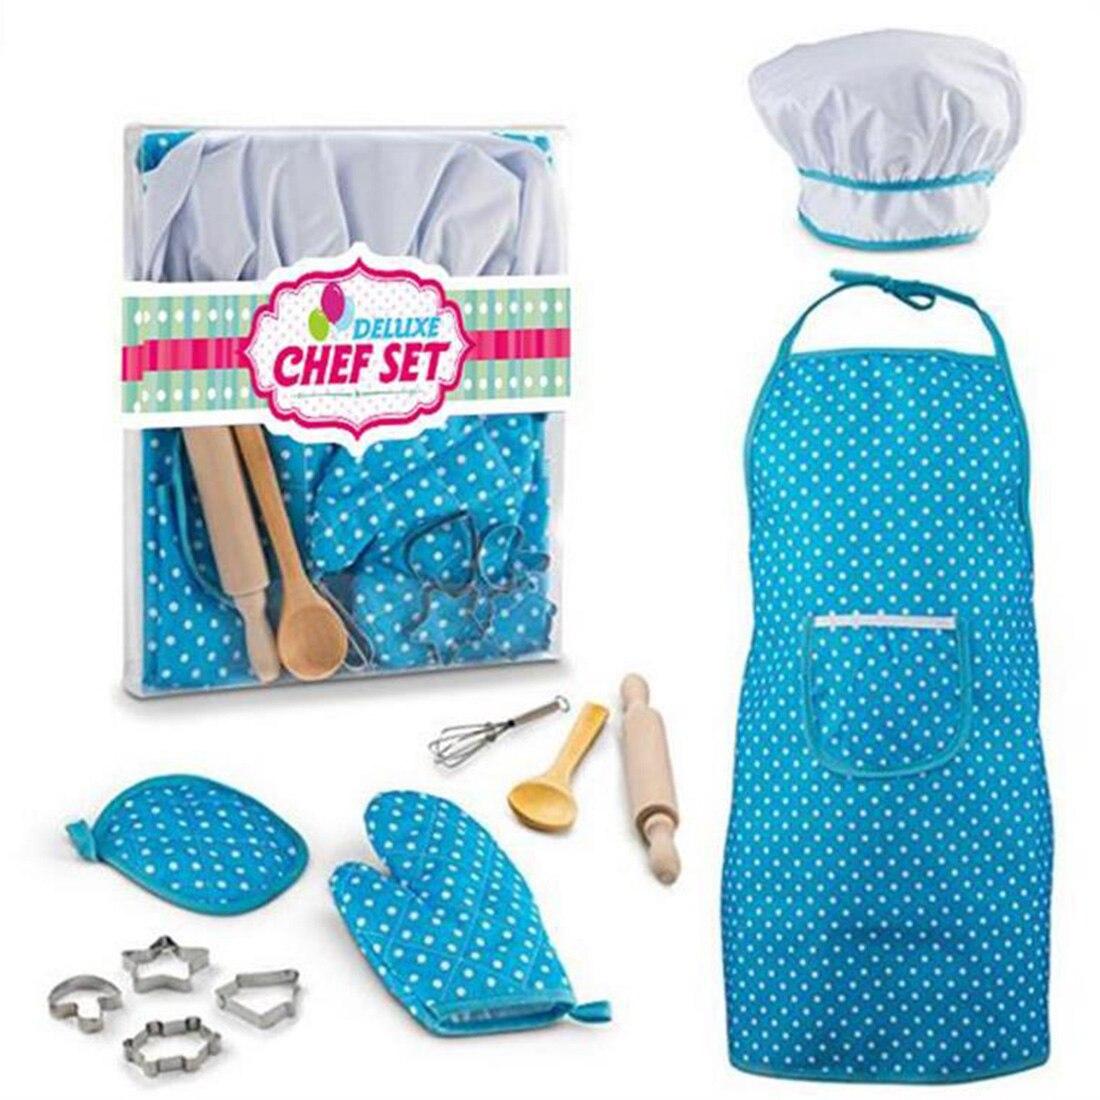 New Creative 11Pcs/set Pretend & Play Emulational Baking Toy Kit DIY Pastry Baker Tool Apron Set for Children 2 ColorsNew Creative 11Pcs/set Pretend & Play Emulational Baking Toy Kit DIY Pastry Baker Tool Apron Set for Children 2 Colors